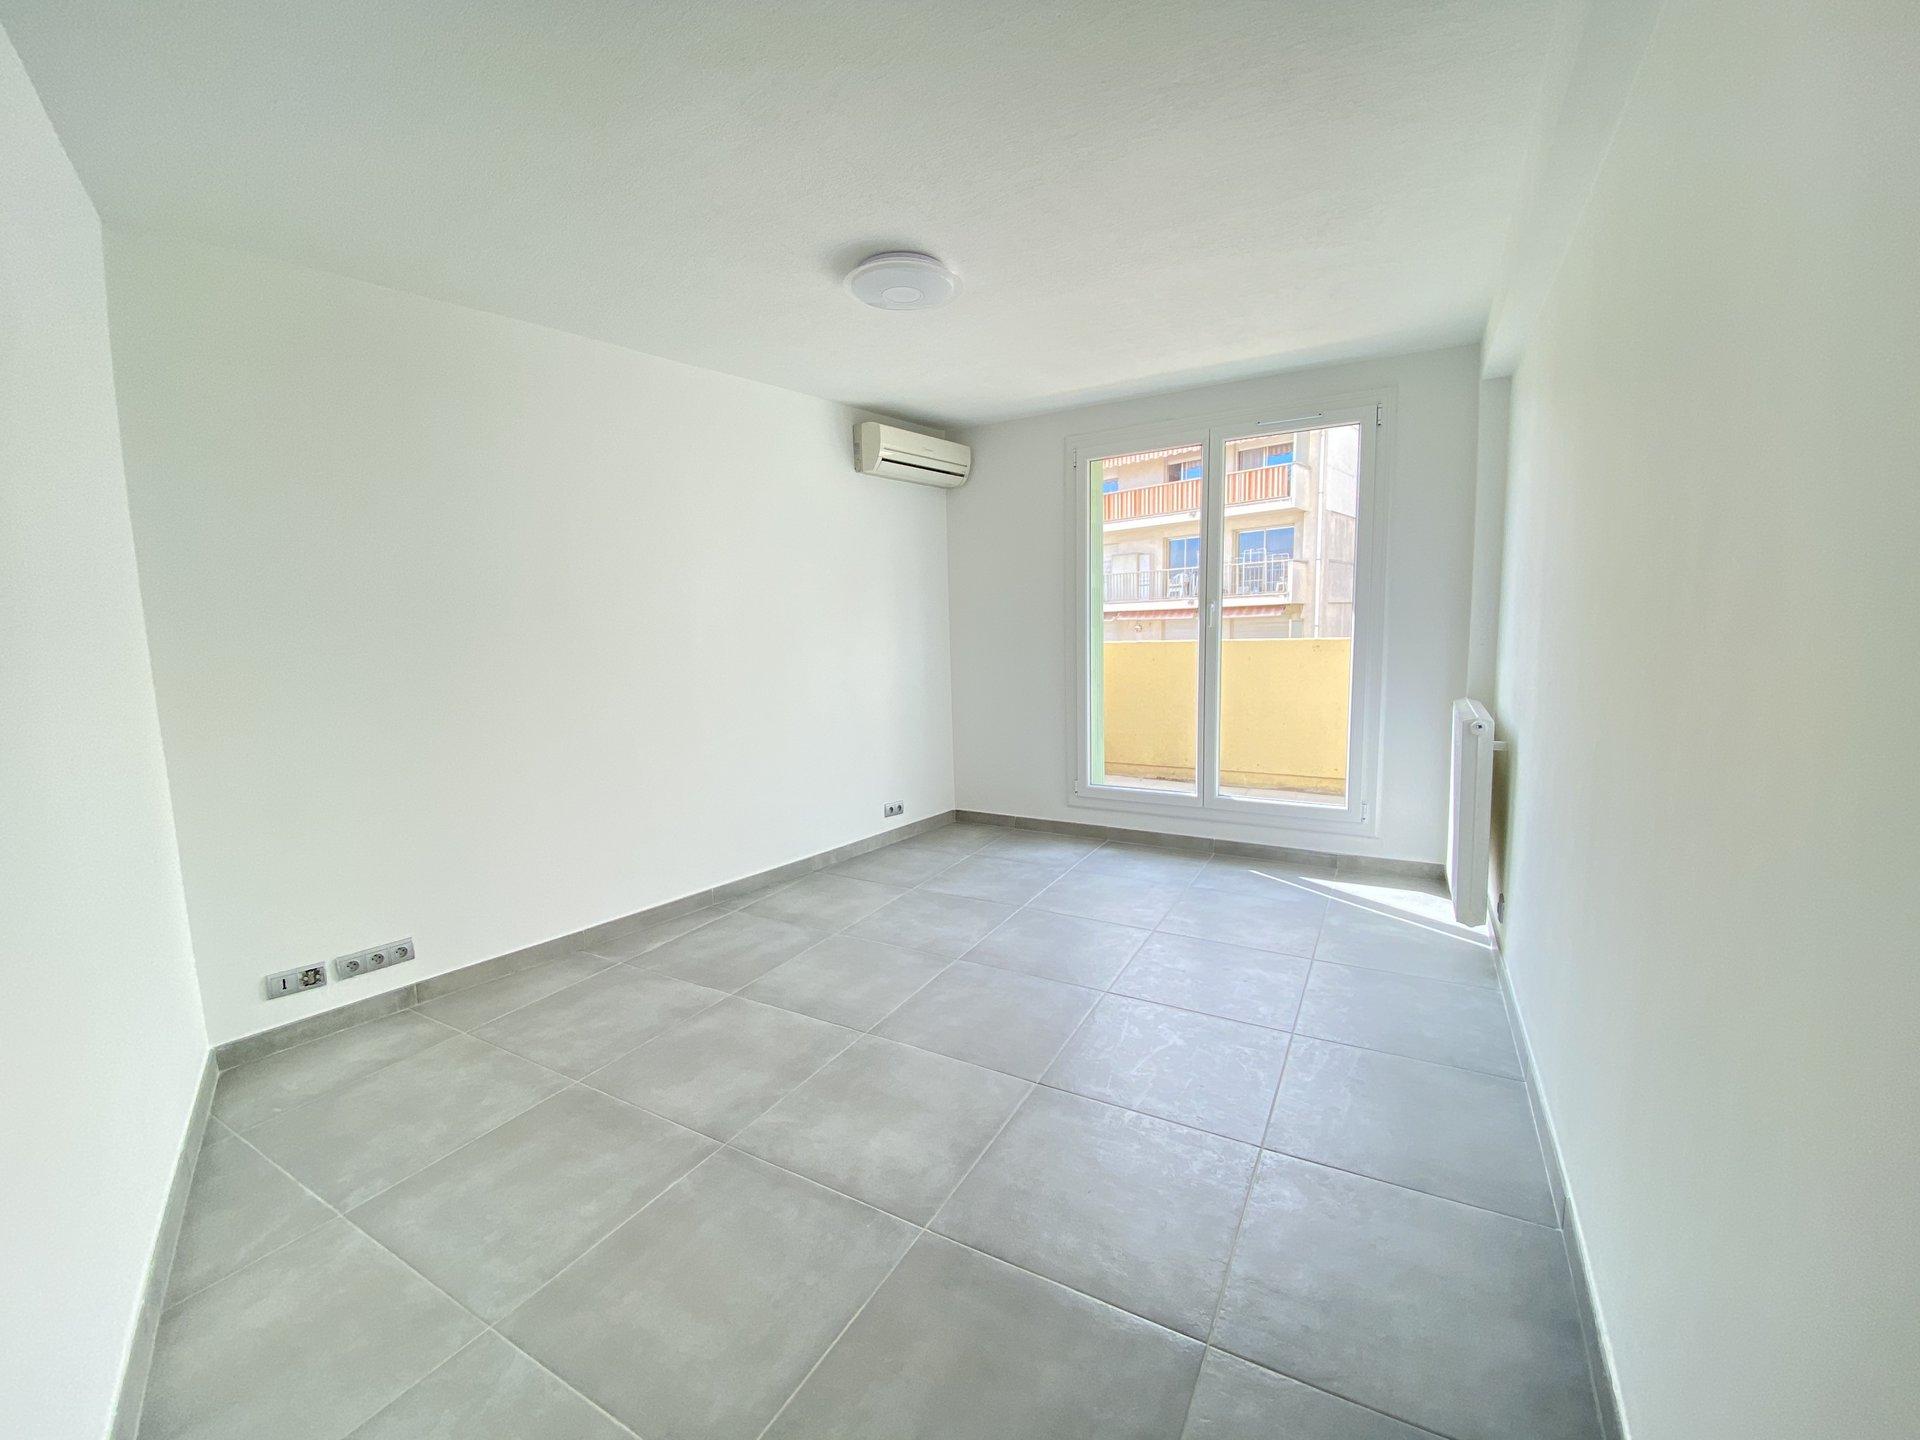 NICE FLEURS - One bedroom with balcony